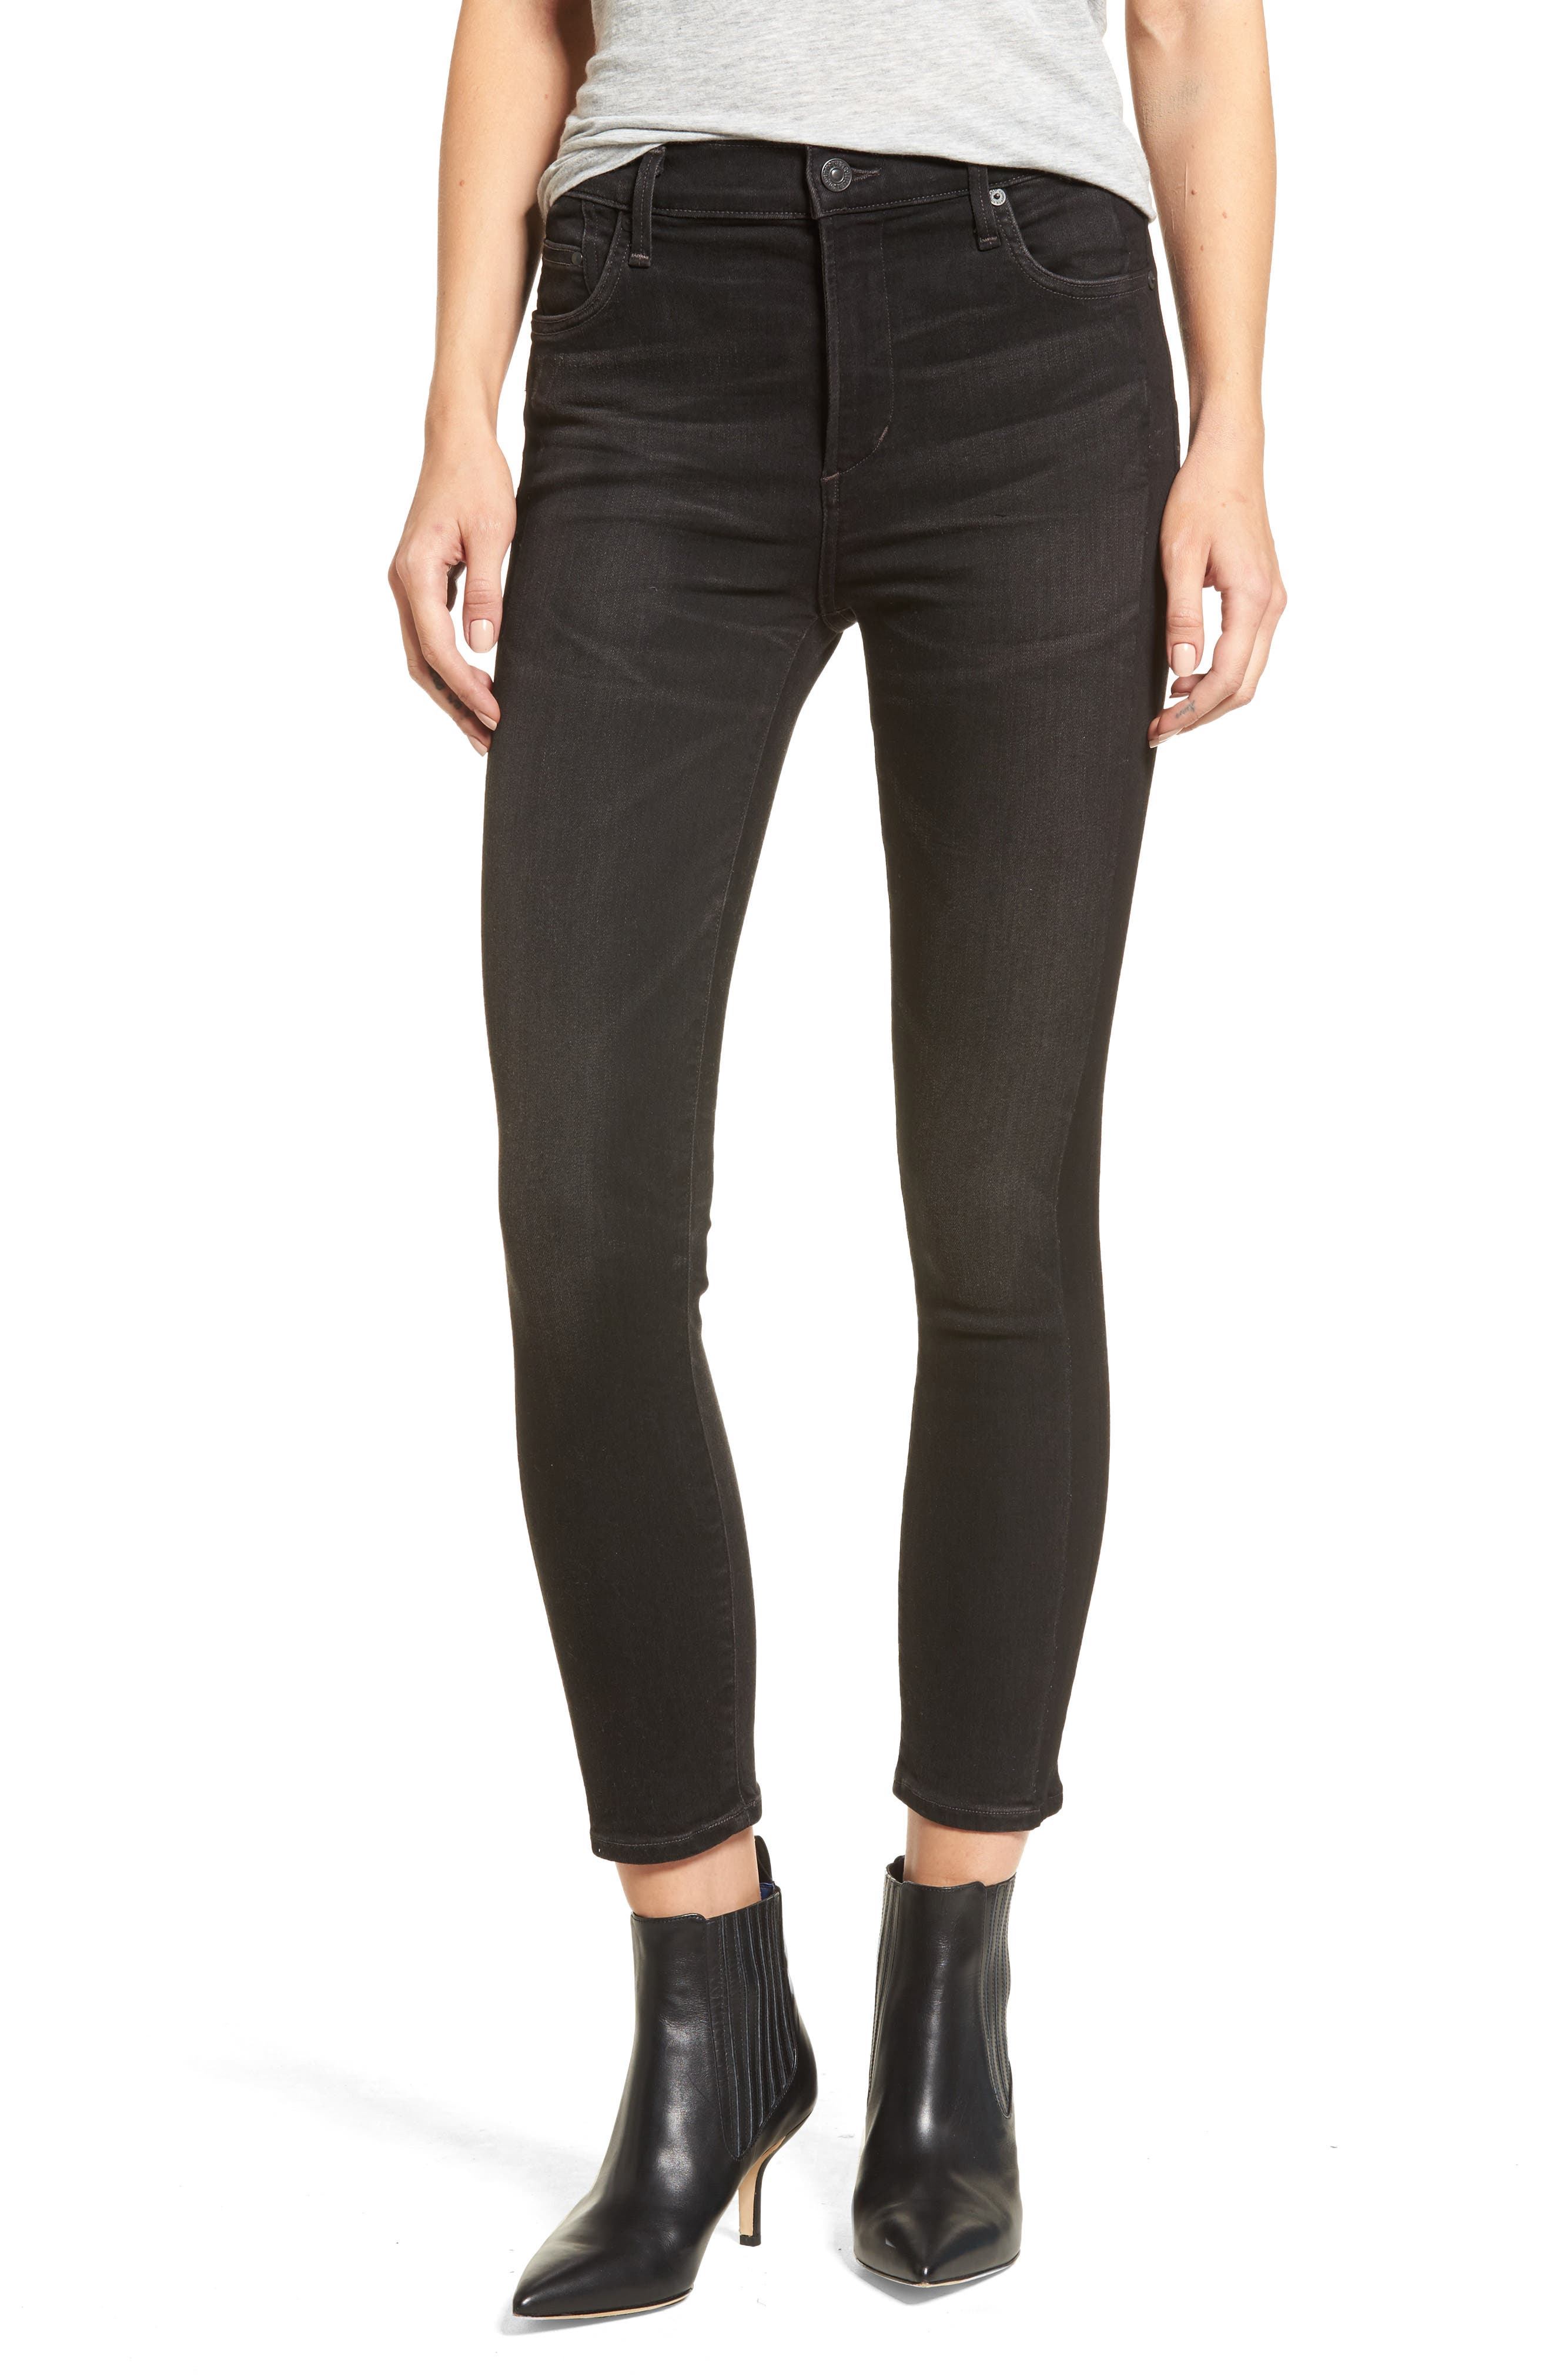 Rocket High Waist Crop Skinny Jeans,                         Main,                         color, 009